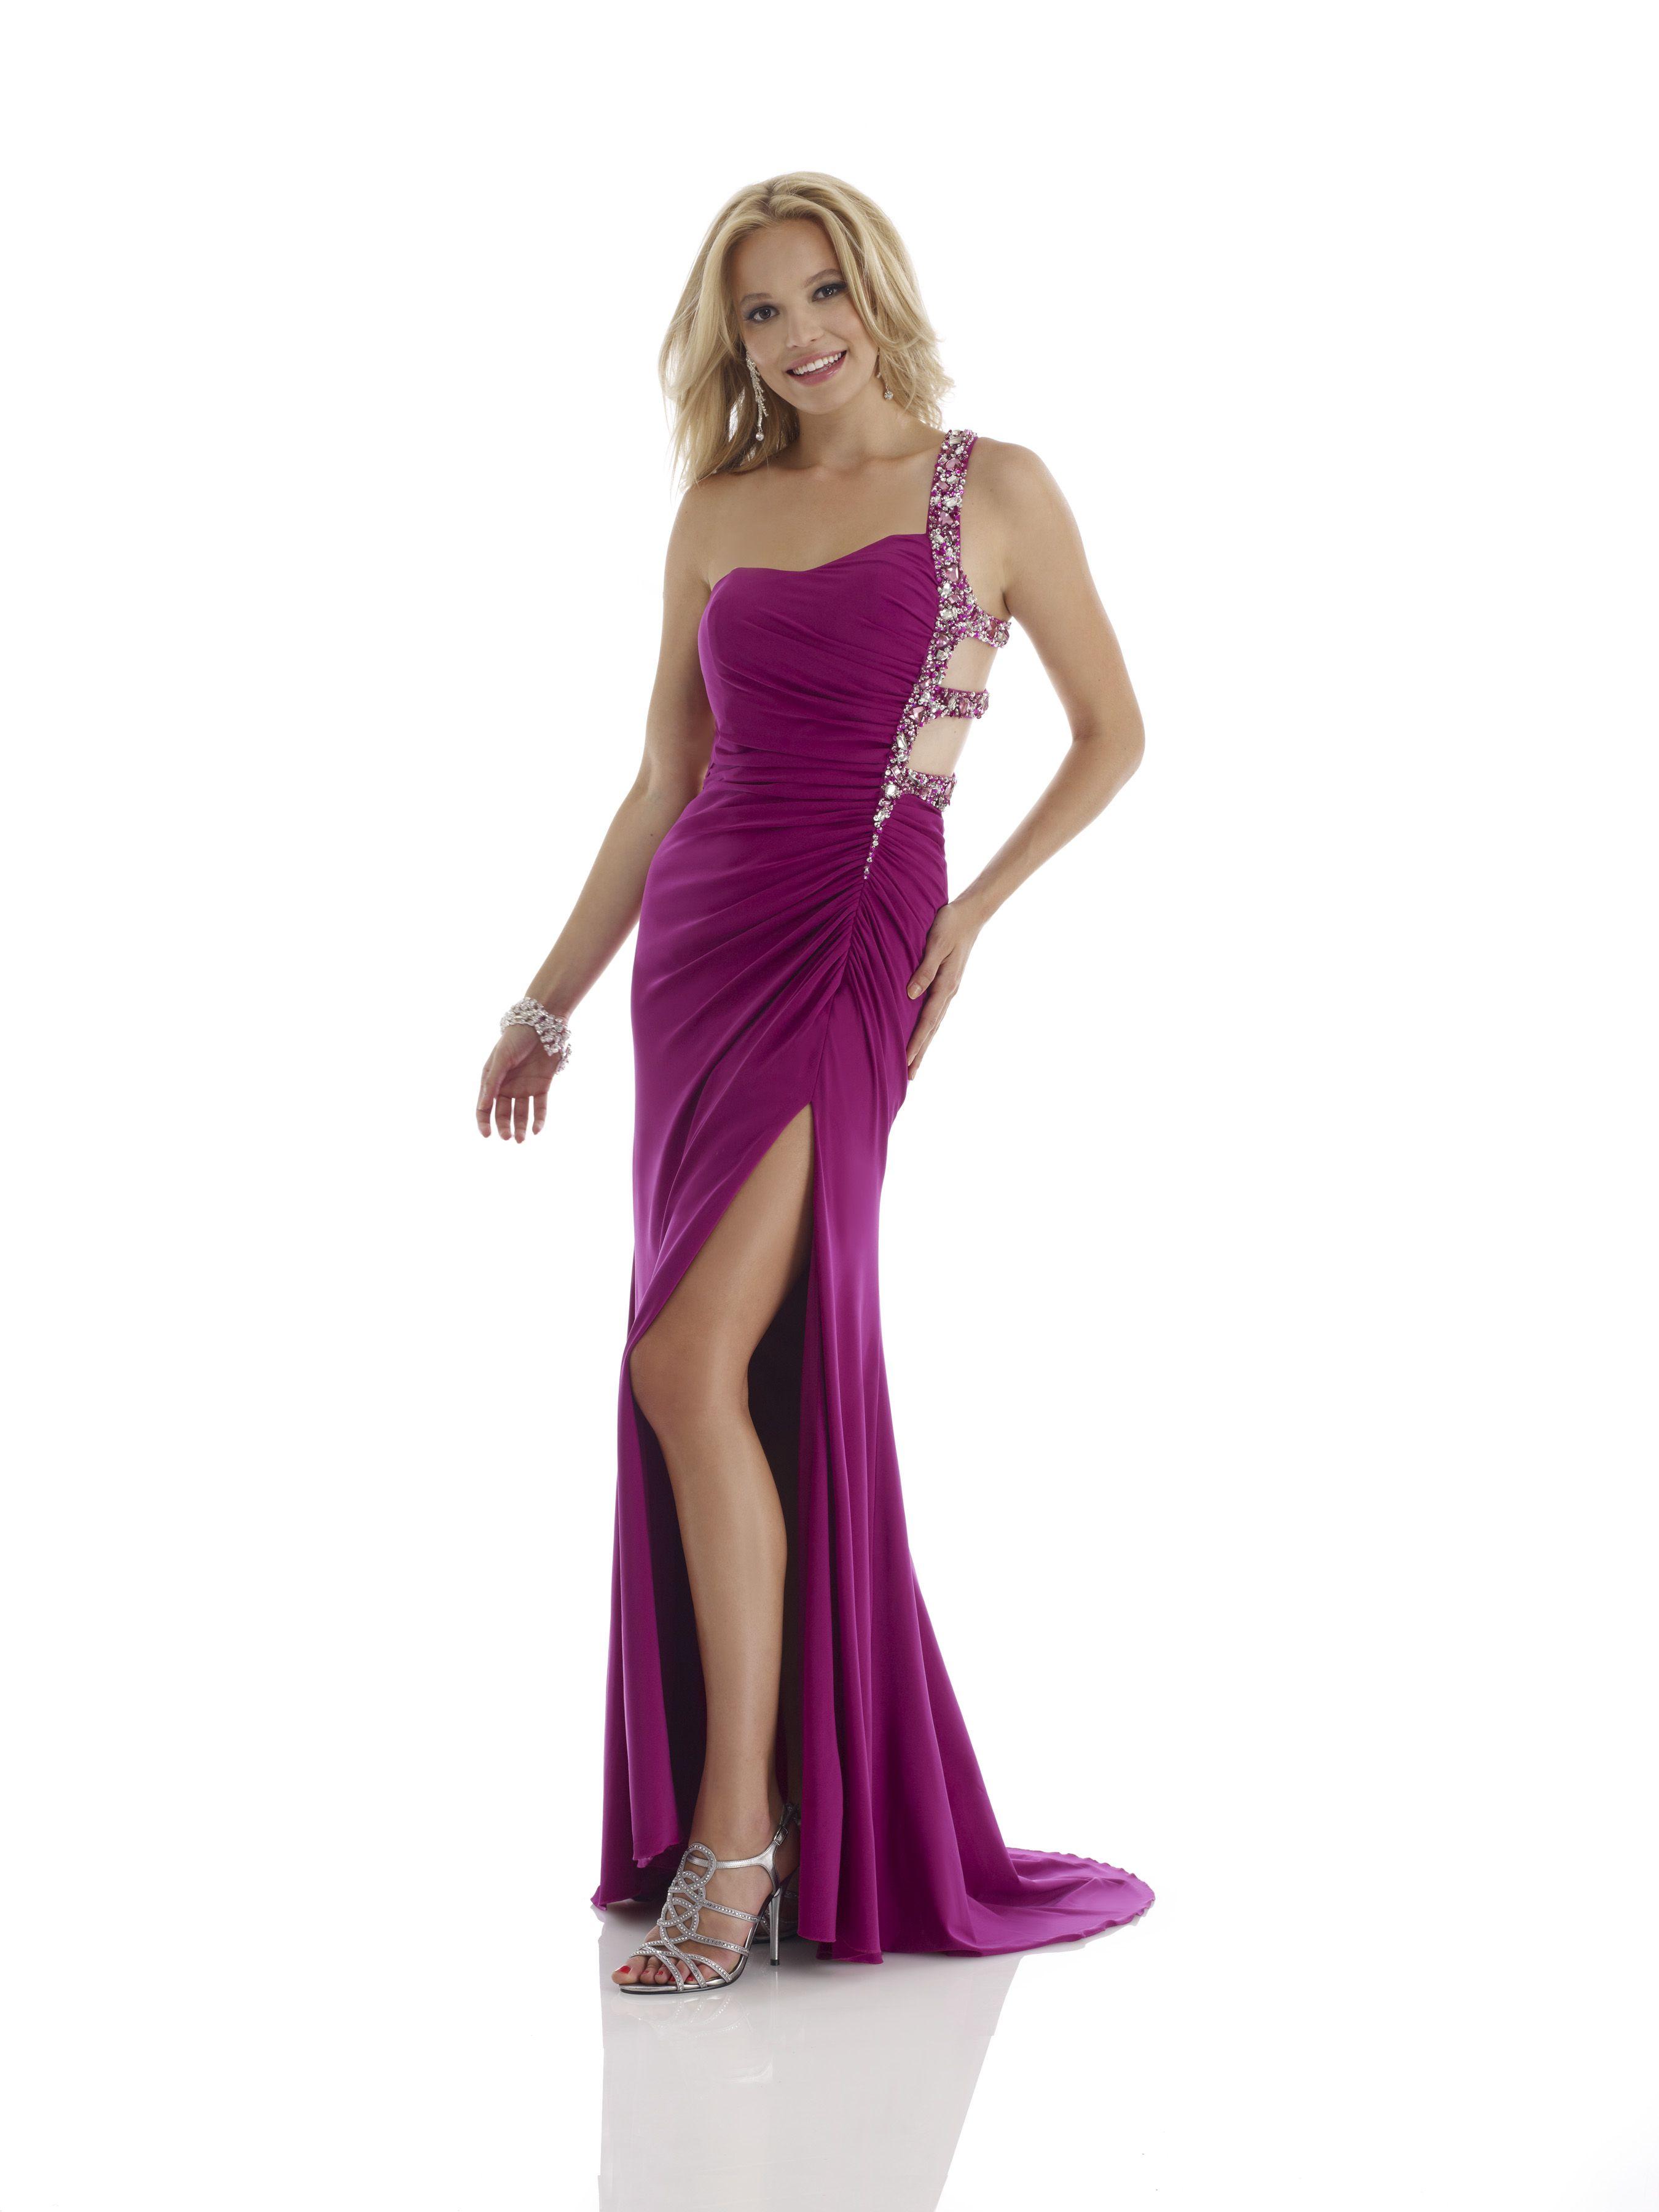 Prom Dresses Ny - Evening Wear